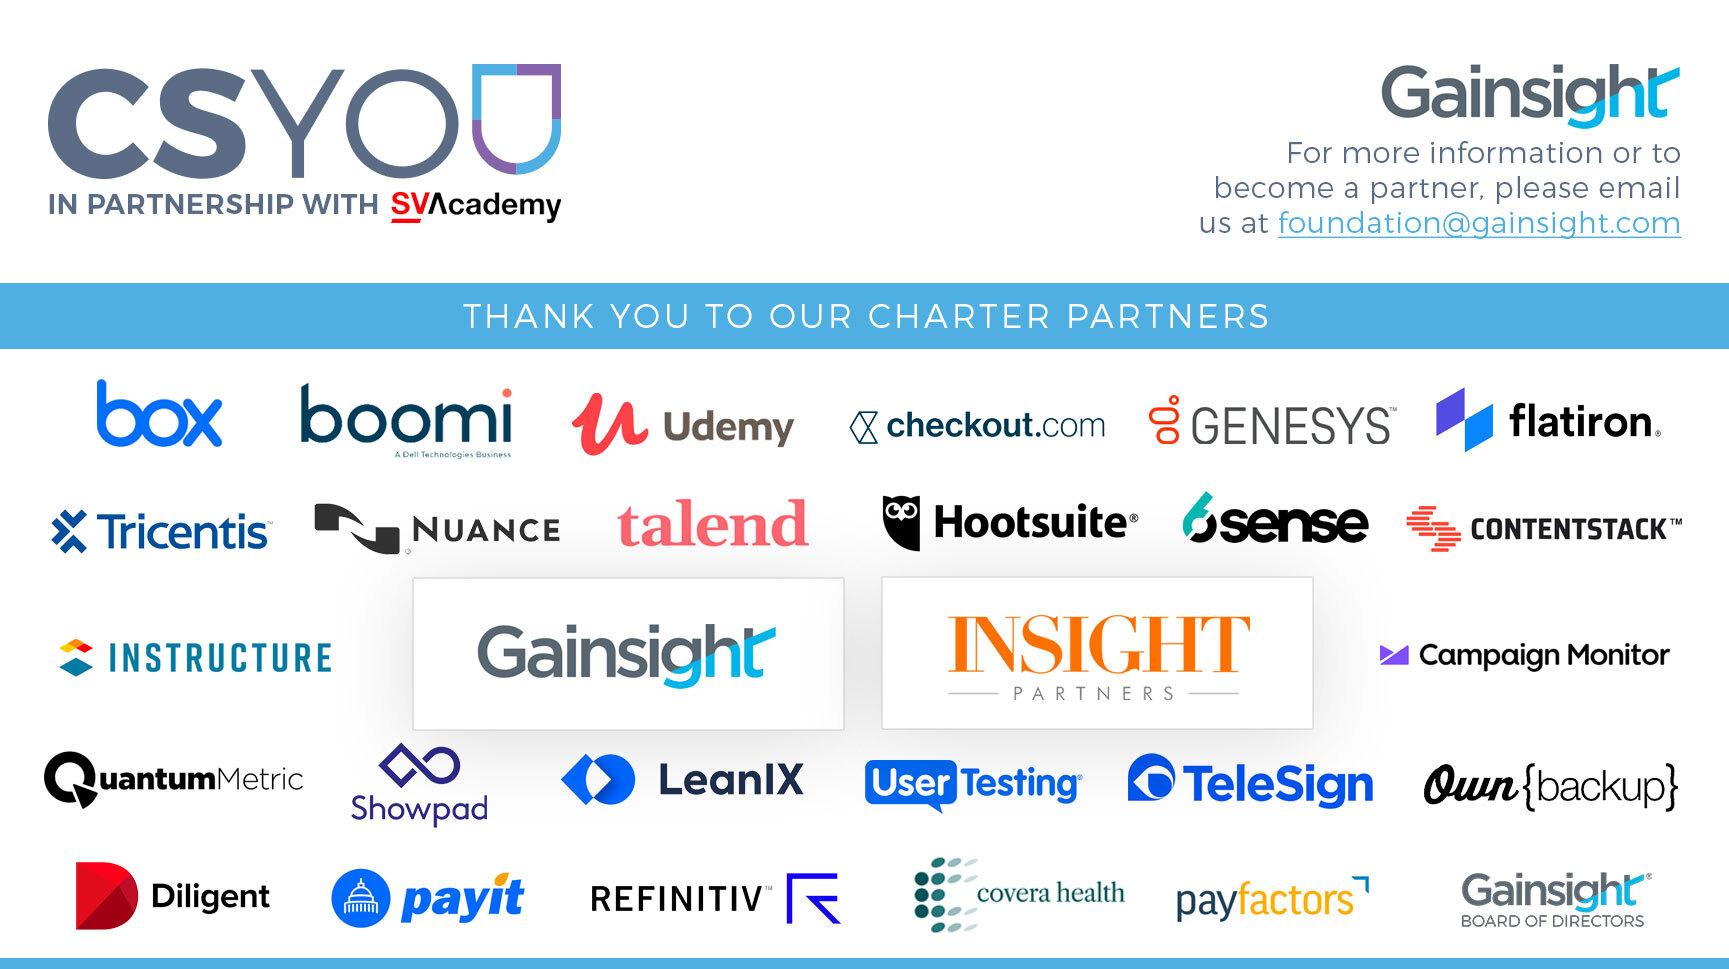 CSYOU Partners